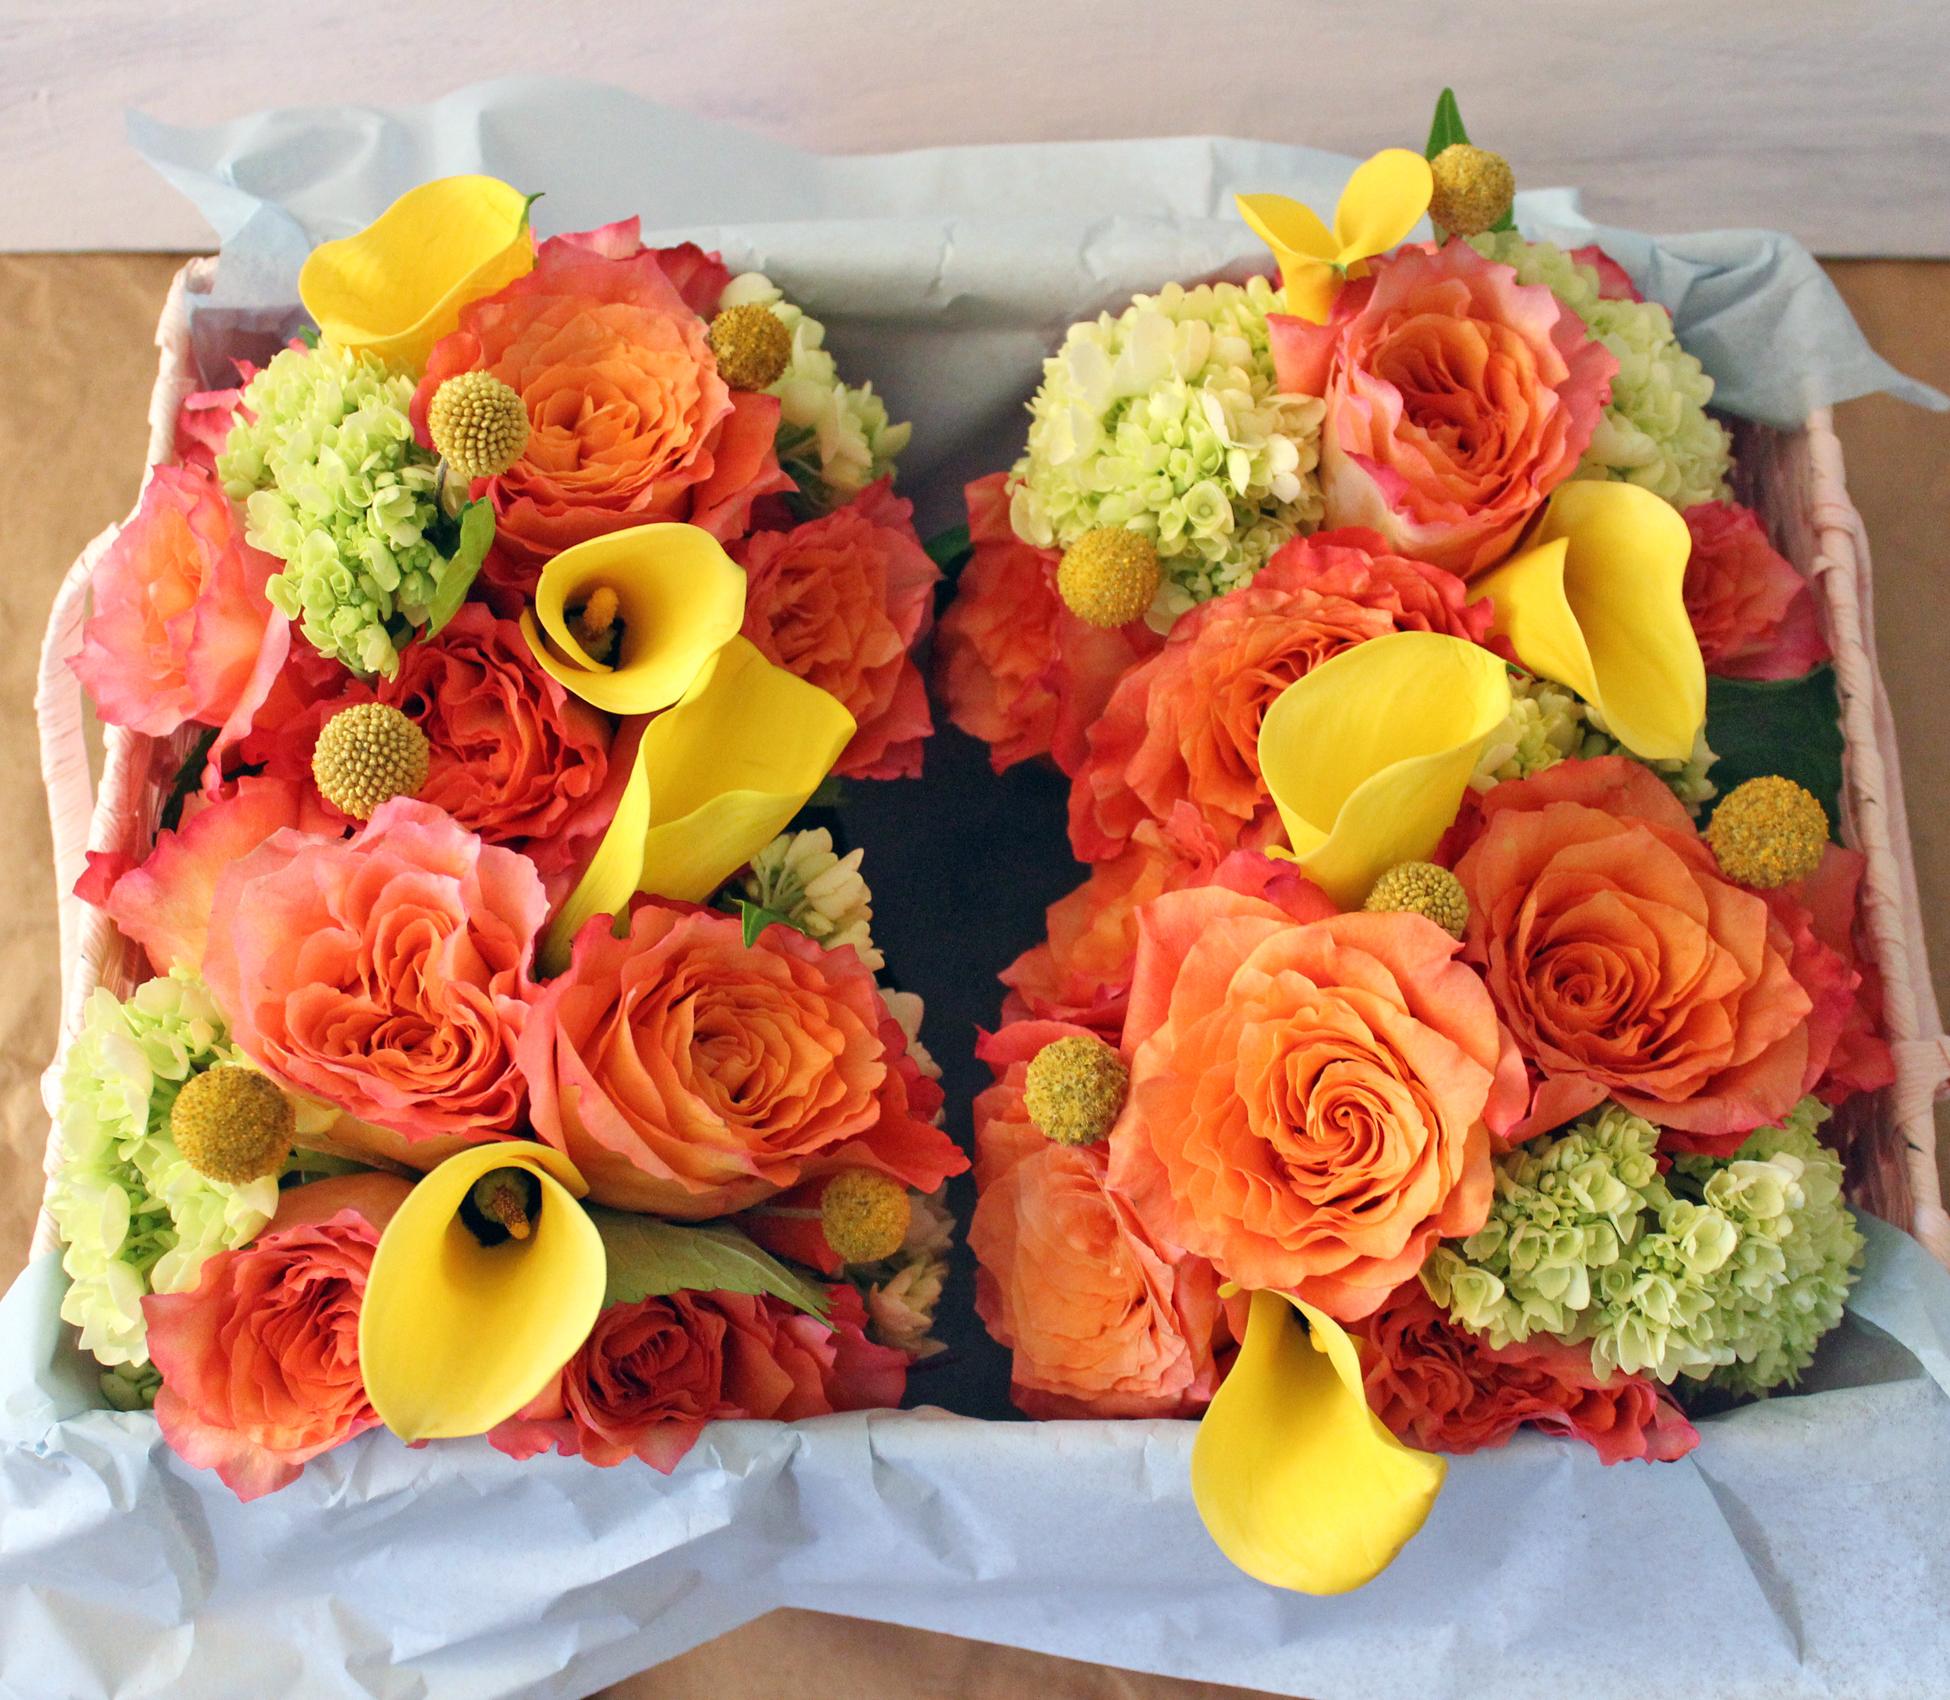 katie-flowers-packed